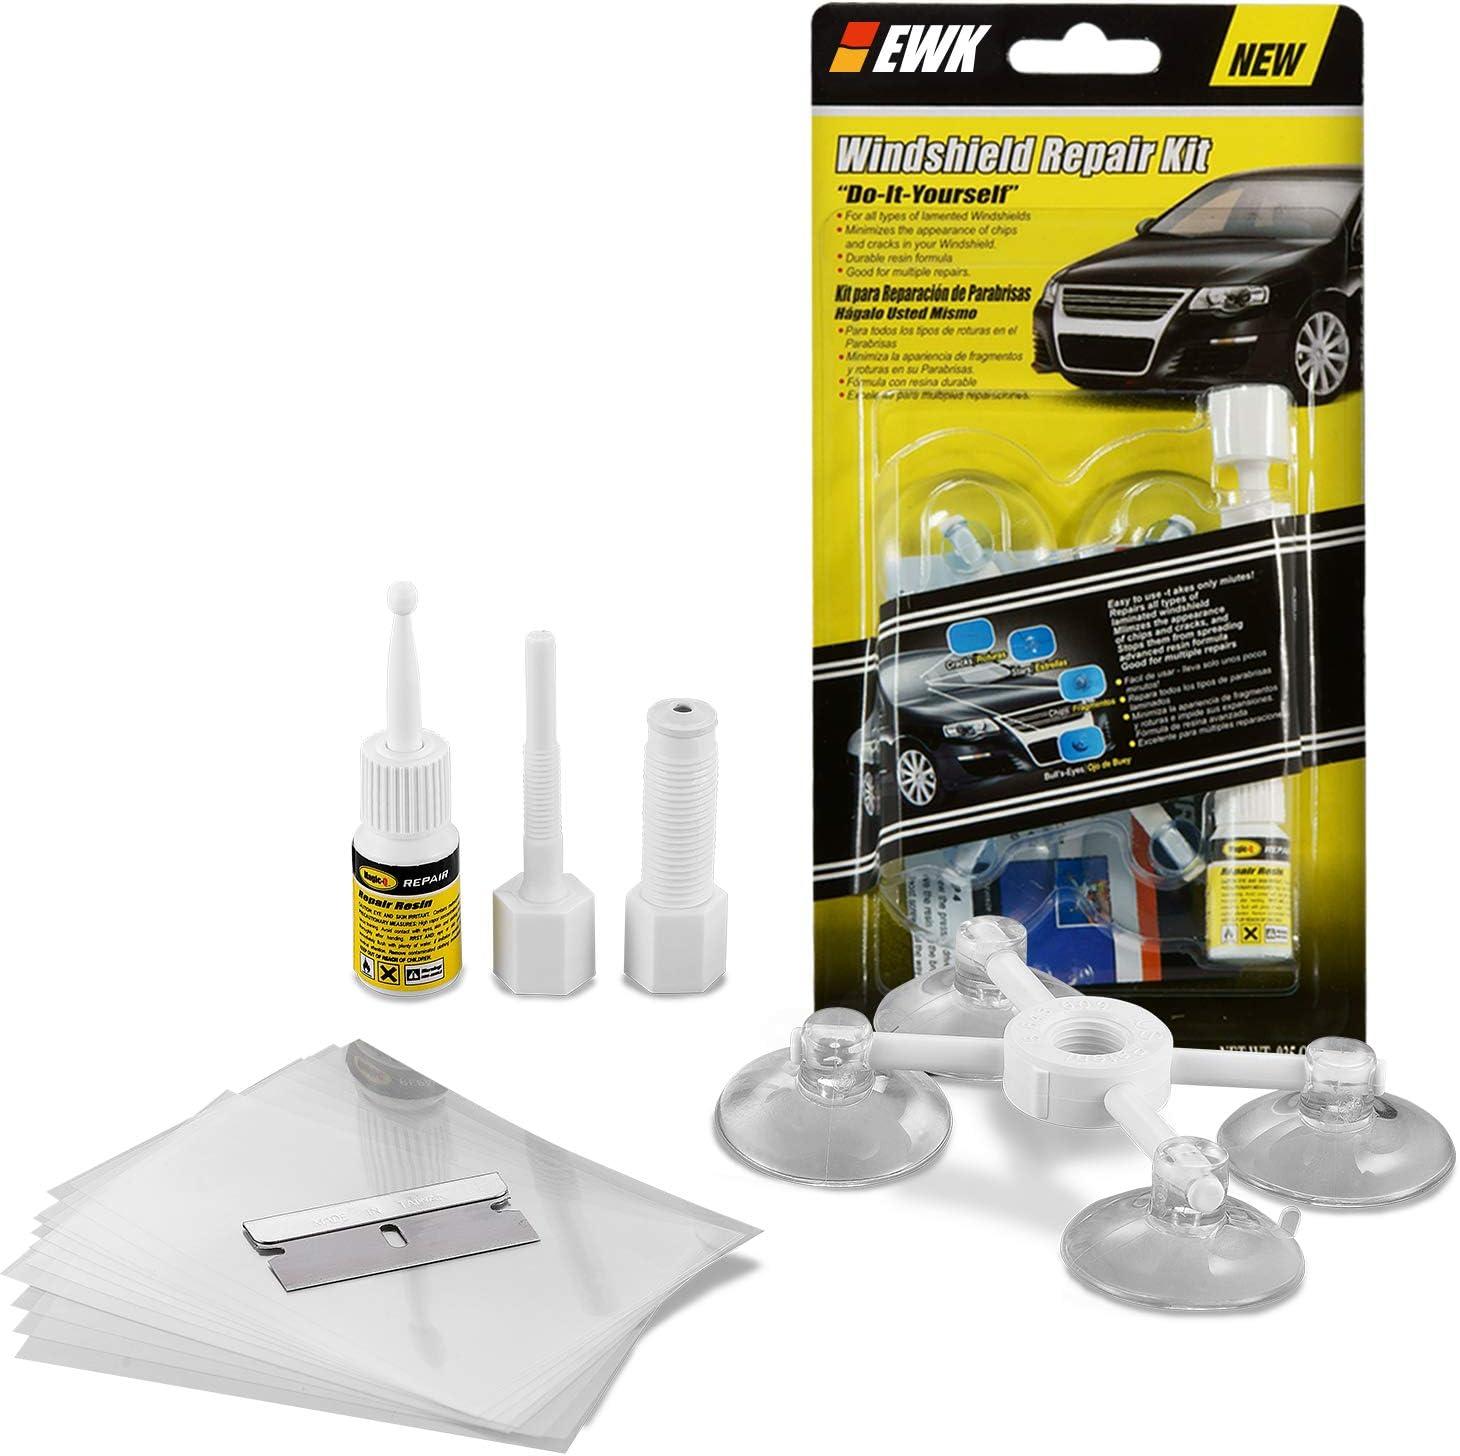 EWK Windshield Repair Kit